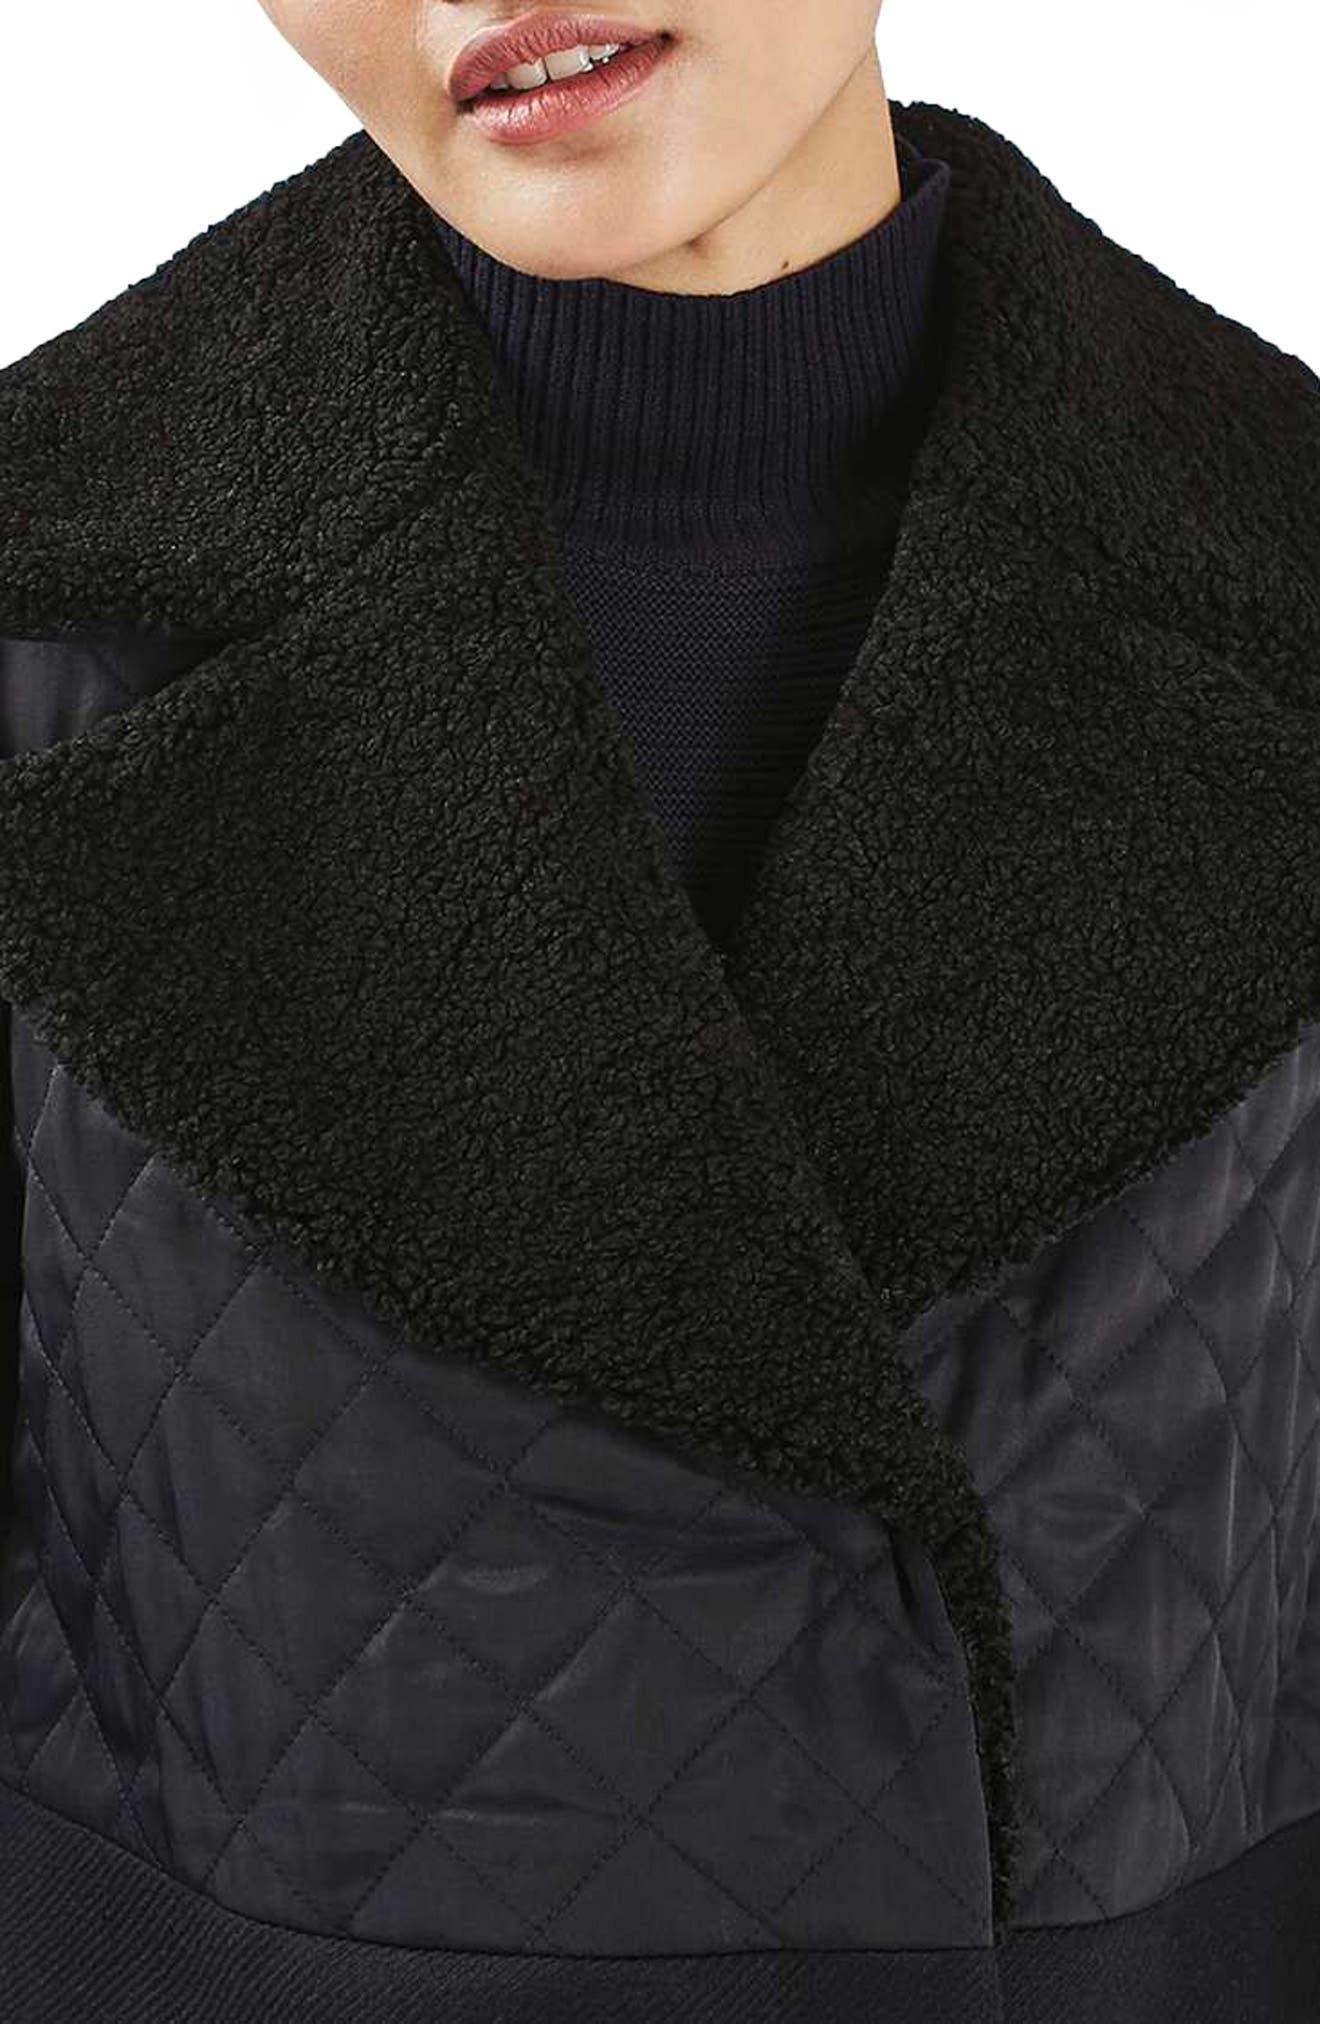 TOPSHOP, Faux Shearling Collar Coat, Alternate thumbnail 3, color, 410